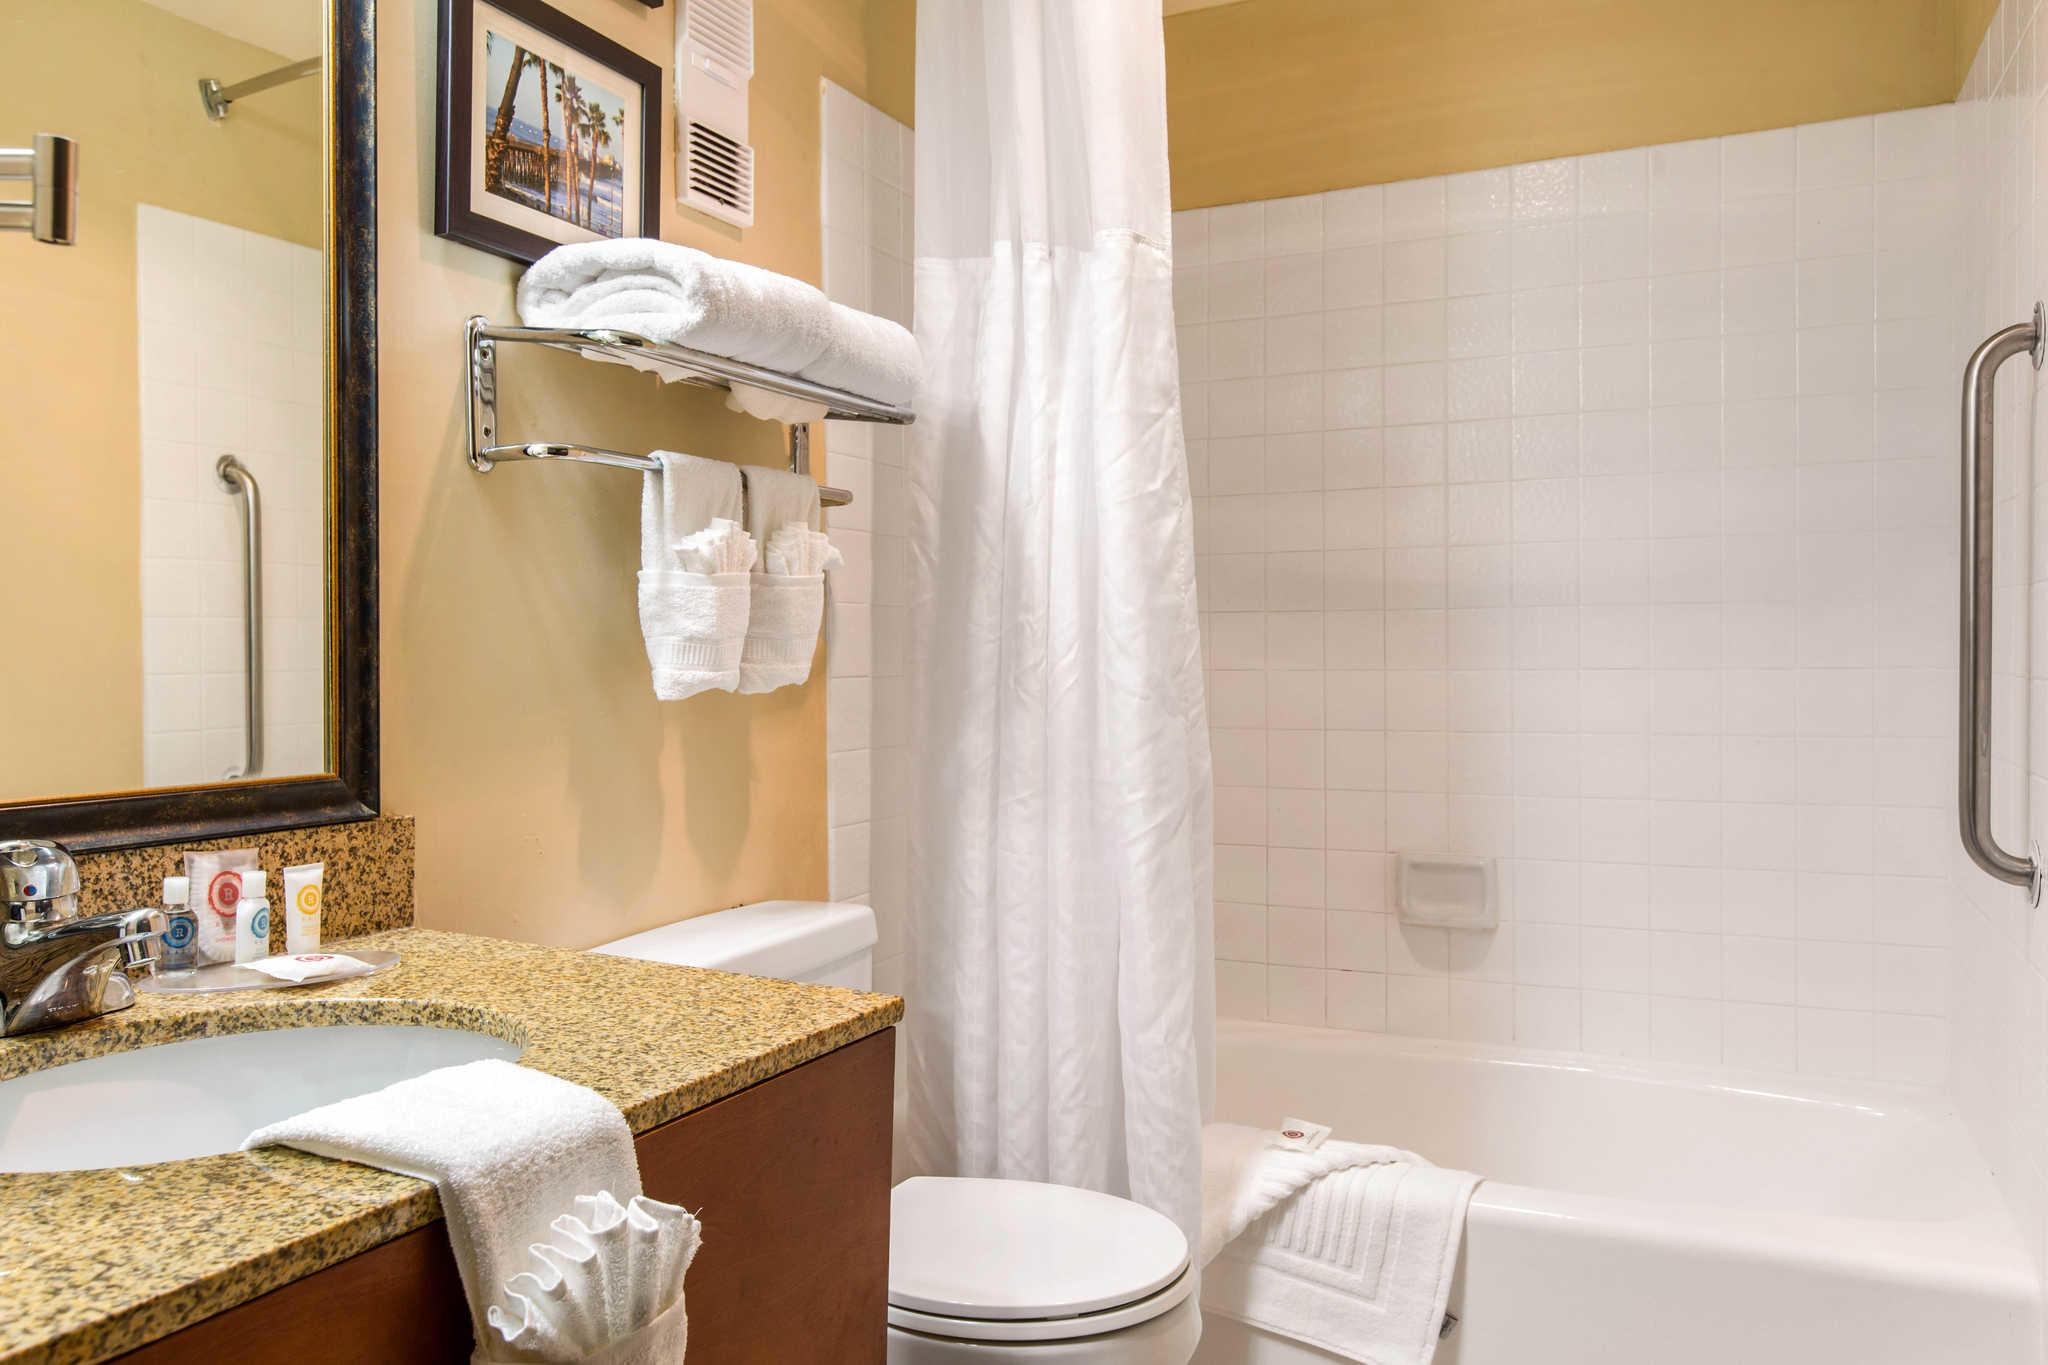 Comfort Inn Escondido San Diego North County image 29